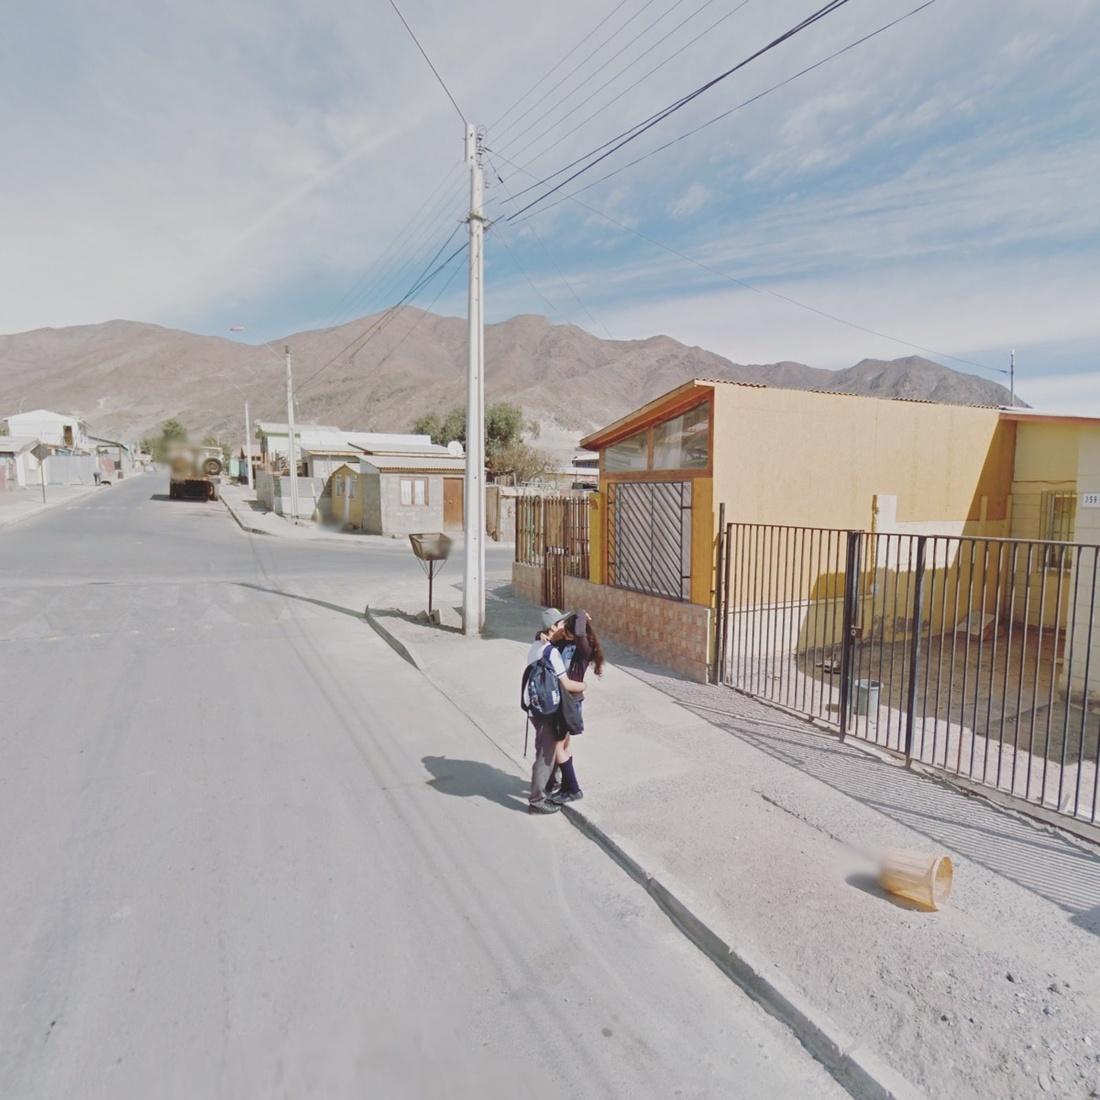 Chañaral, Atacama Region, Chile. Photograph by Jacqui Kenny via Google Street View.